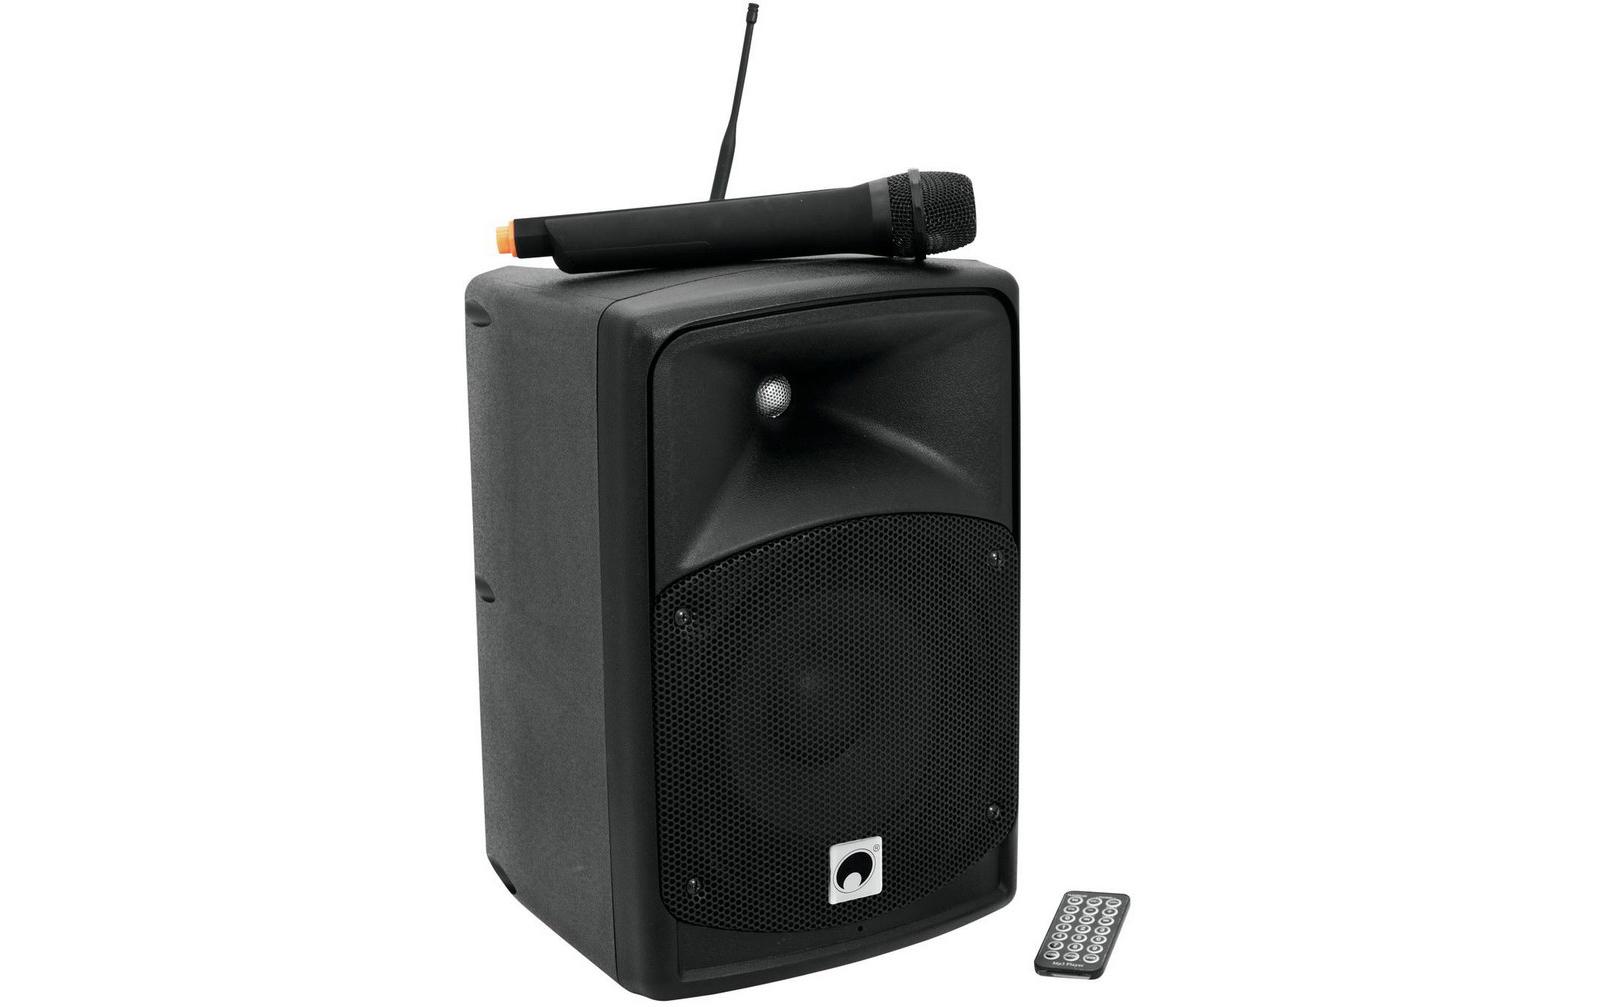 omnitronic-wams-08bt-drahtlos-pa-system